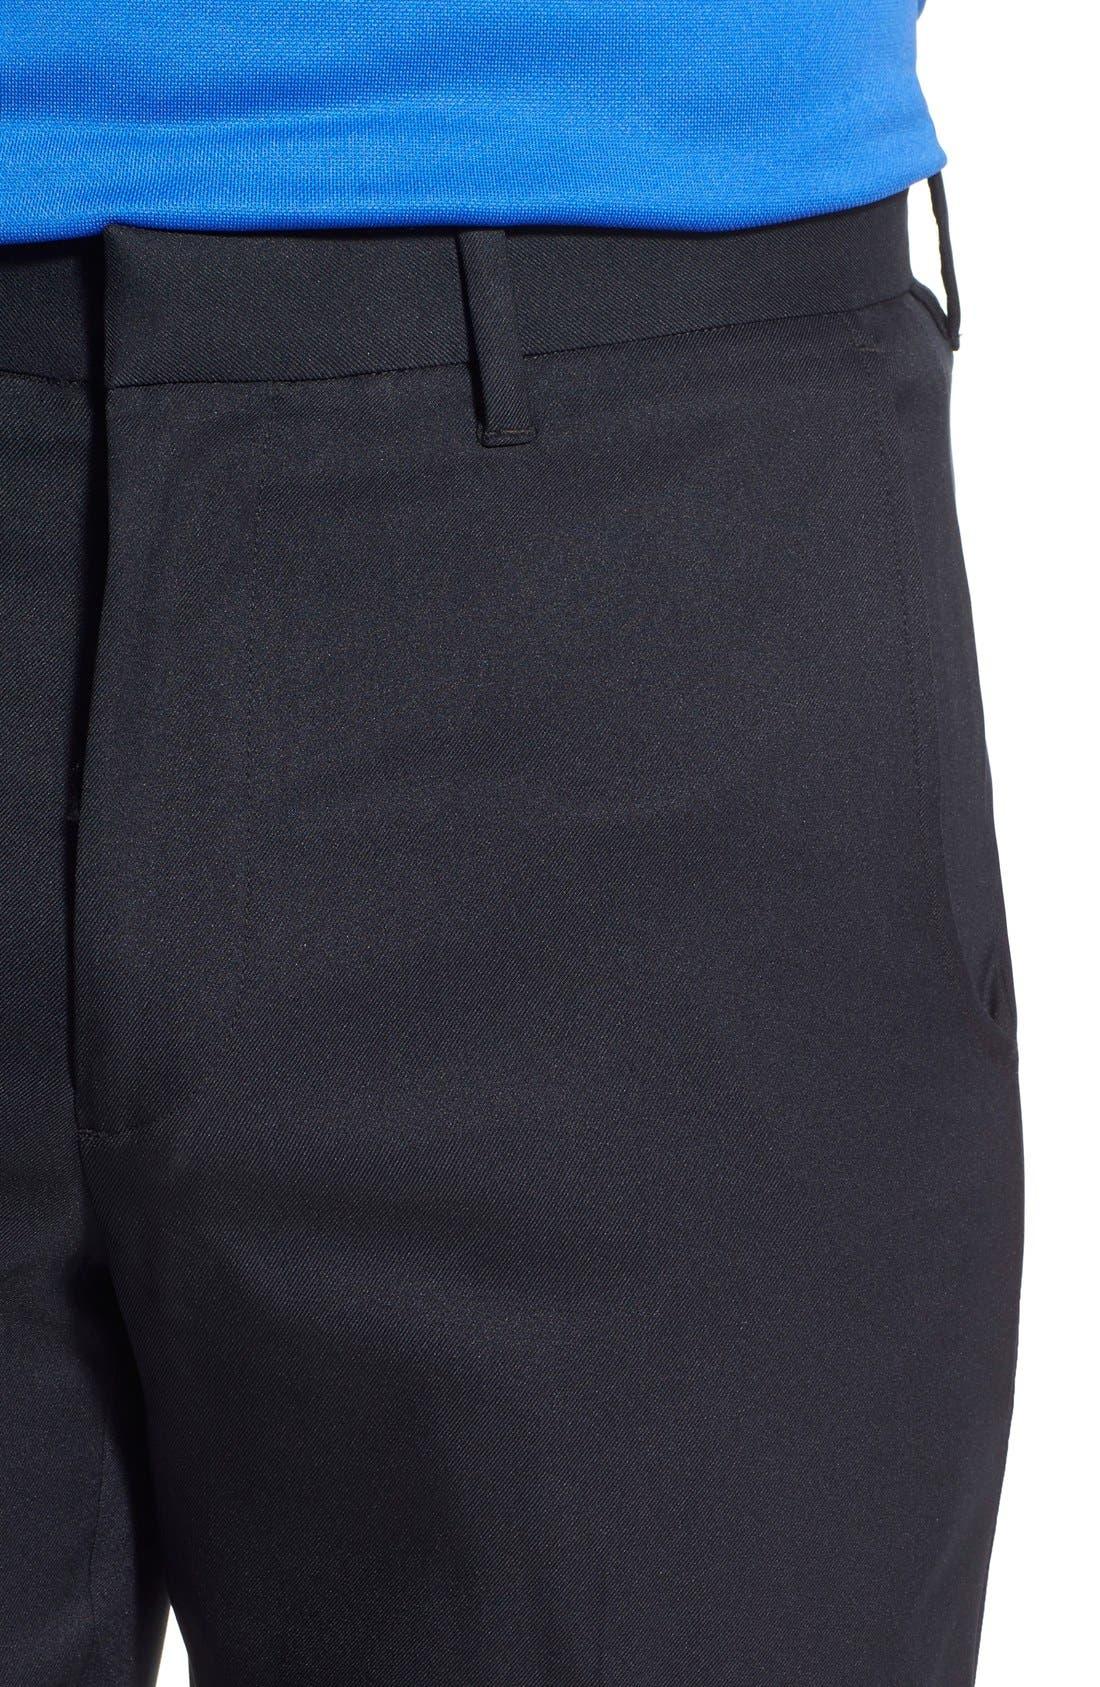 'Tech' Flat Front Wrinkle Free Golf Pants,                             Alternate thumbnail 23, color,